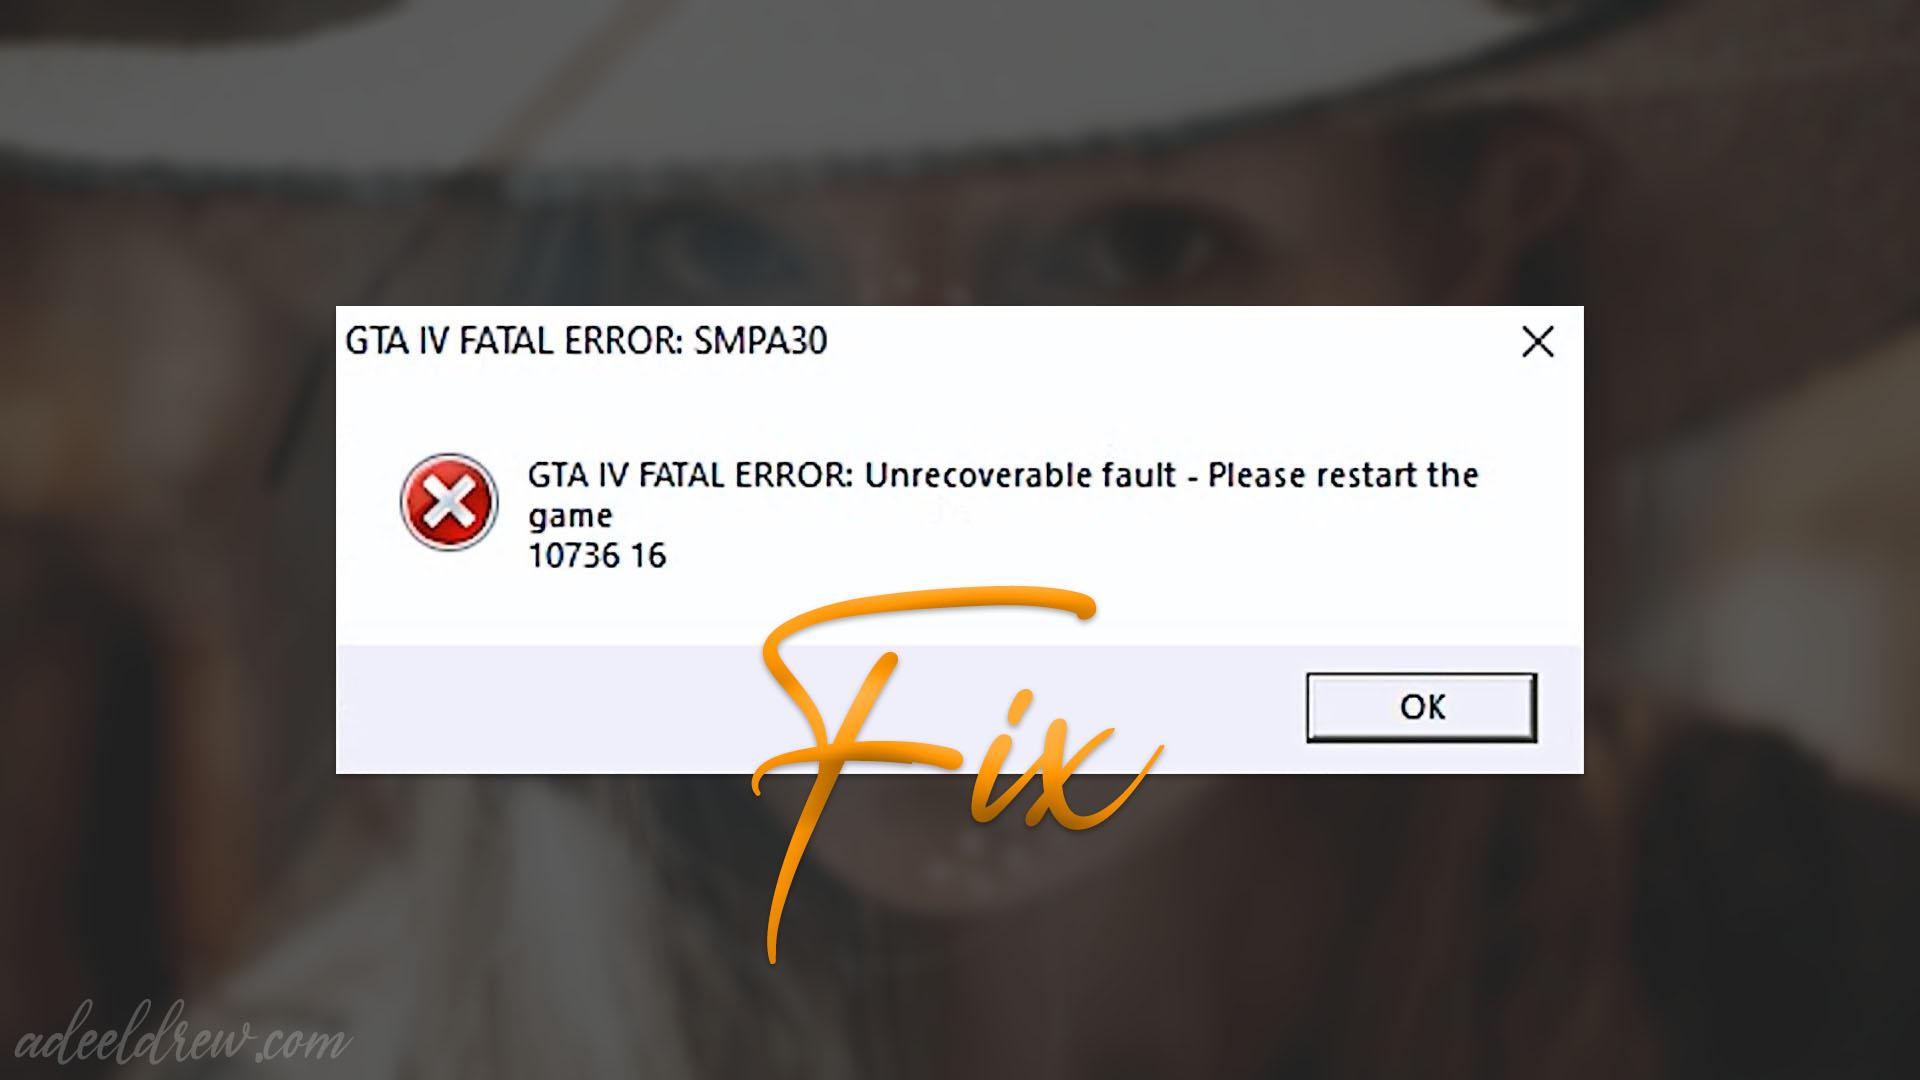 How to Fix GTA 4 Fatal Error: SMPA30 in Grand Theft Auto IV - GTA IV FATAL ERROR: Unrecoverable fault restart the game 10736 16 gta 4 error connecting to server police gta 4 error 2000 gta 4 error fix gta 4 error 0xc00007b gta 4 error code 1 gta 4 error code 7002.1 gta 4 error in script gta 4 error resc10 gta 4 error application failed to launch gta 4 all error fix crack gta 4 all error fix gta 4 application error 0xc00007b gta 4 an error occurred when unpacking unarc.dll gta 4 application error gta 4 activation error gta 4 application error 2000 gta 4 error binkw32.dll gta 4 bex error fix gta 4 error side by side configuration incorrect gta 4 black screen error gta 4 bad image error gta 4 error the ordinal 43 could not be located gta 4 error the ordinal 42 could not be located gta 4 error code 1001 gta 4 error code 1014 gta 4 error could not run gtaiv.exe gta 4 error code 2000 gta 4 error code resc10 gta 4 error dfa did not initialize properly gta 4 error d3dx9_31.dll gta 4 error dsound.dll gta 4 error d3d gta 4 error dd3d30 gta 4 error dd3d50 gta 4 error d3dx9_37.dll gta 4 error during installation gta 4 error entry point not found gta 4 eflc error xlive dll gta 4 eflc error gta 4 exe error gta 4 exception error gta 4 fatal error efc20 gta 4 fatal error efc20 windows 10 gta 4 fatal error efc20 fix gta 4 error failed to start application 2000 gta 4 error fixer gta 4 error fatal gta 4 error fix dll gta 4 fatal error ws10 gta 4 fatal error rmn60 gta 4 fatal error resc10 gta 4 error graphics gta 4 error graficos gta 4 graphics error fix gta 4 save game error gta 4 fatal error please restart game gta 4 fatal error reinstall the game gta 5 error guard 4 gta 4 g r error how to fix gta 4 error how to fix gta 4 error its side by side configuration how to fix gta 4 error resc10 gta iv hud error gta 4 fatal error hatası gta 4 error 2000 hatası çözümü gta 4 fatal error hatası çözümü gta 4 crc error hatası çözümü gta 4 error installation gta 4 error invalid resource detected g